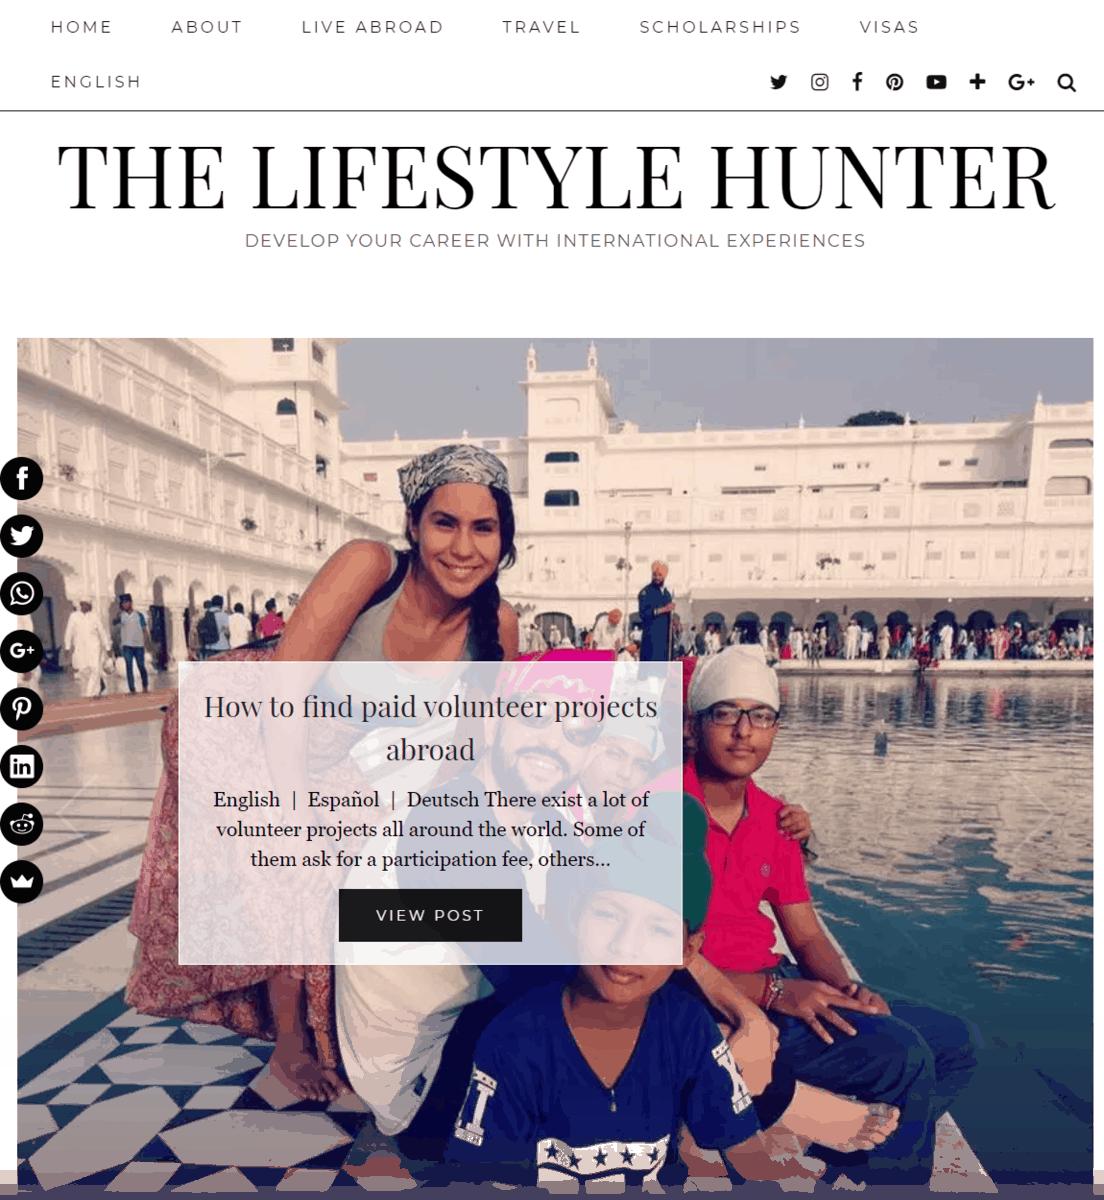 The Lifestyle Hunter